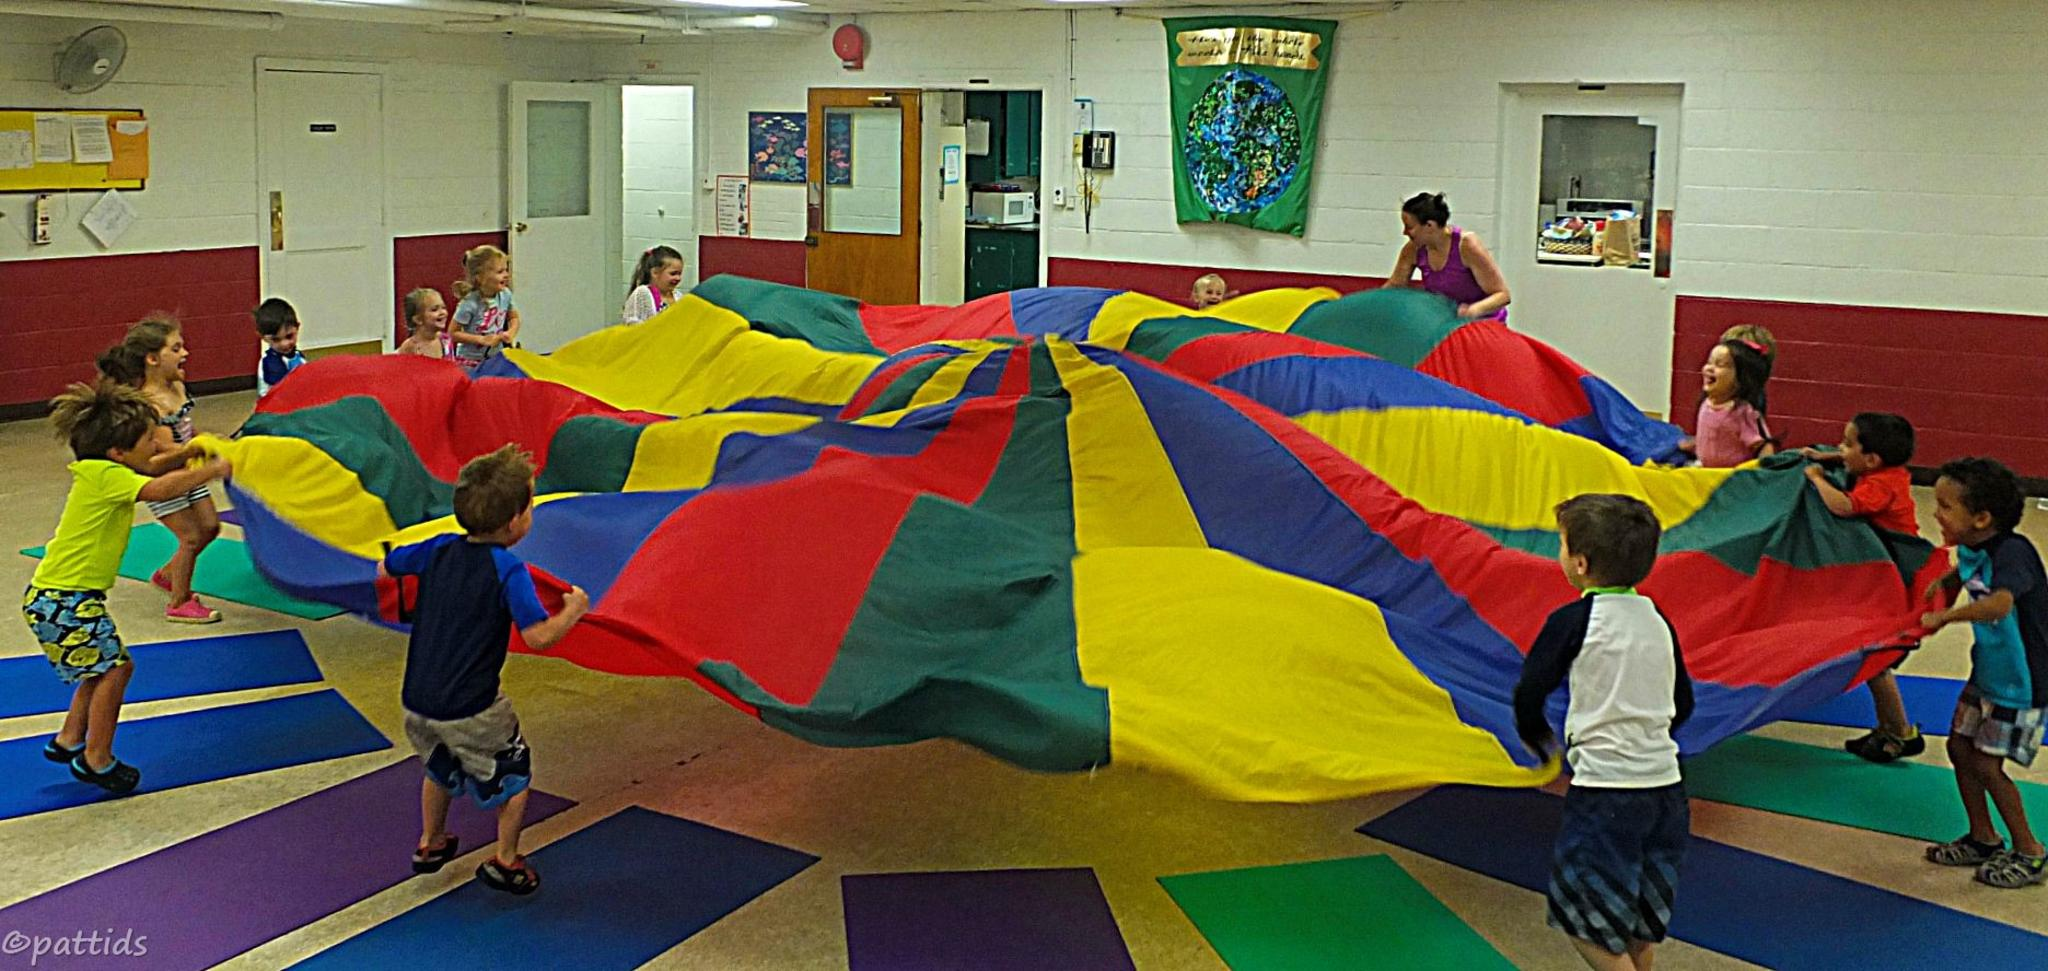 more parachute fun by pattids